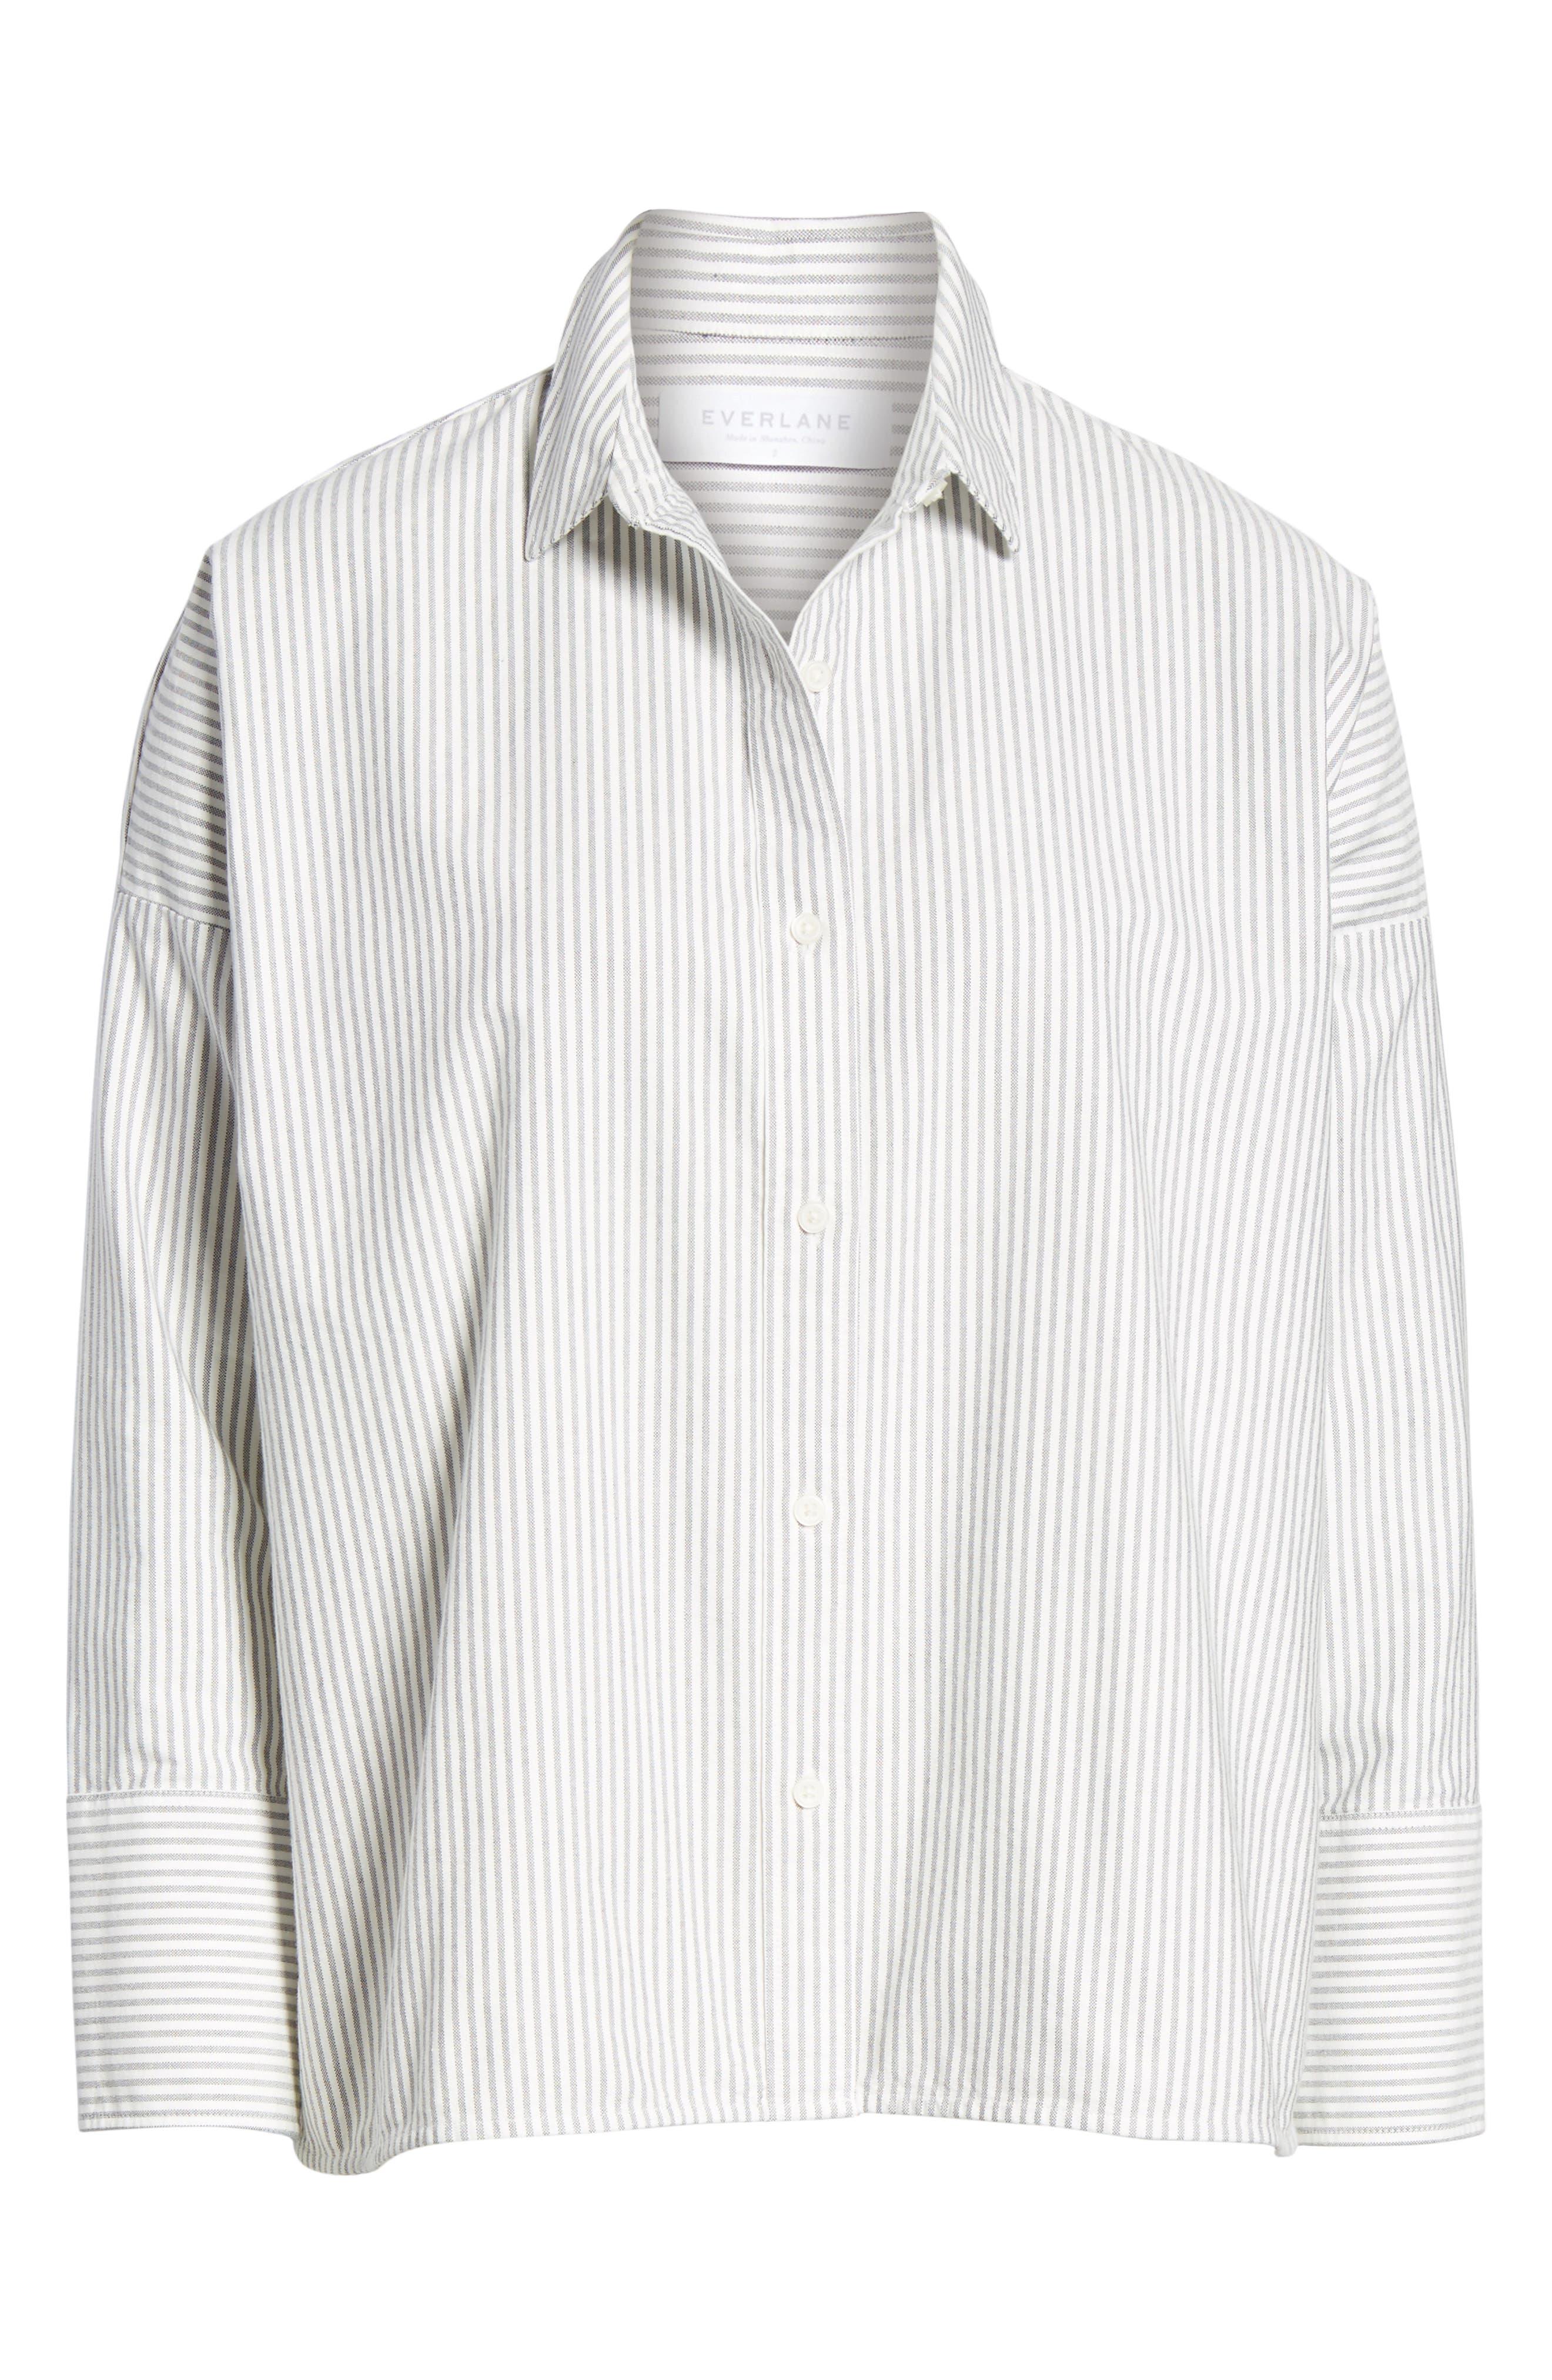 Alternate Image 5  - Everlane The Japanese Oxford Square Shirt